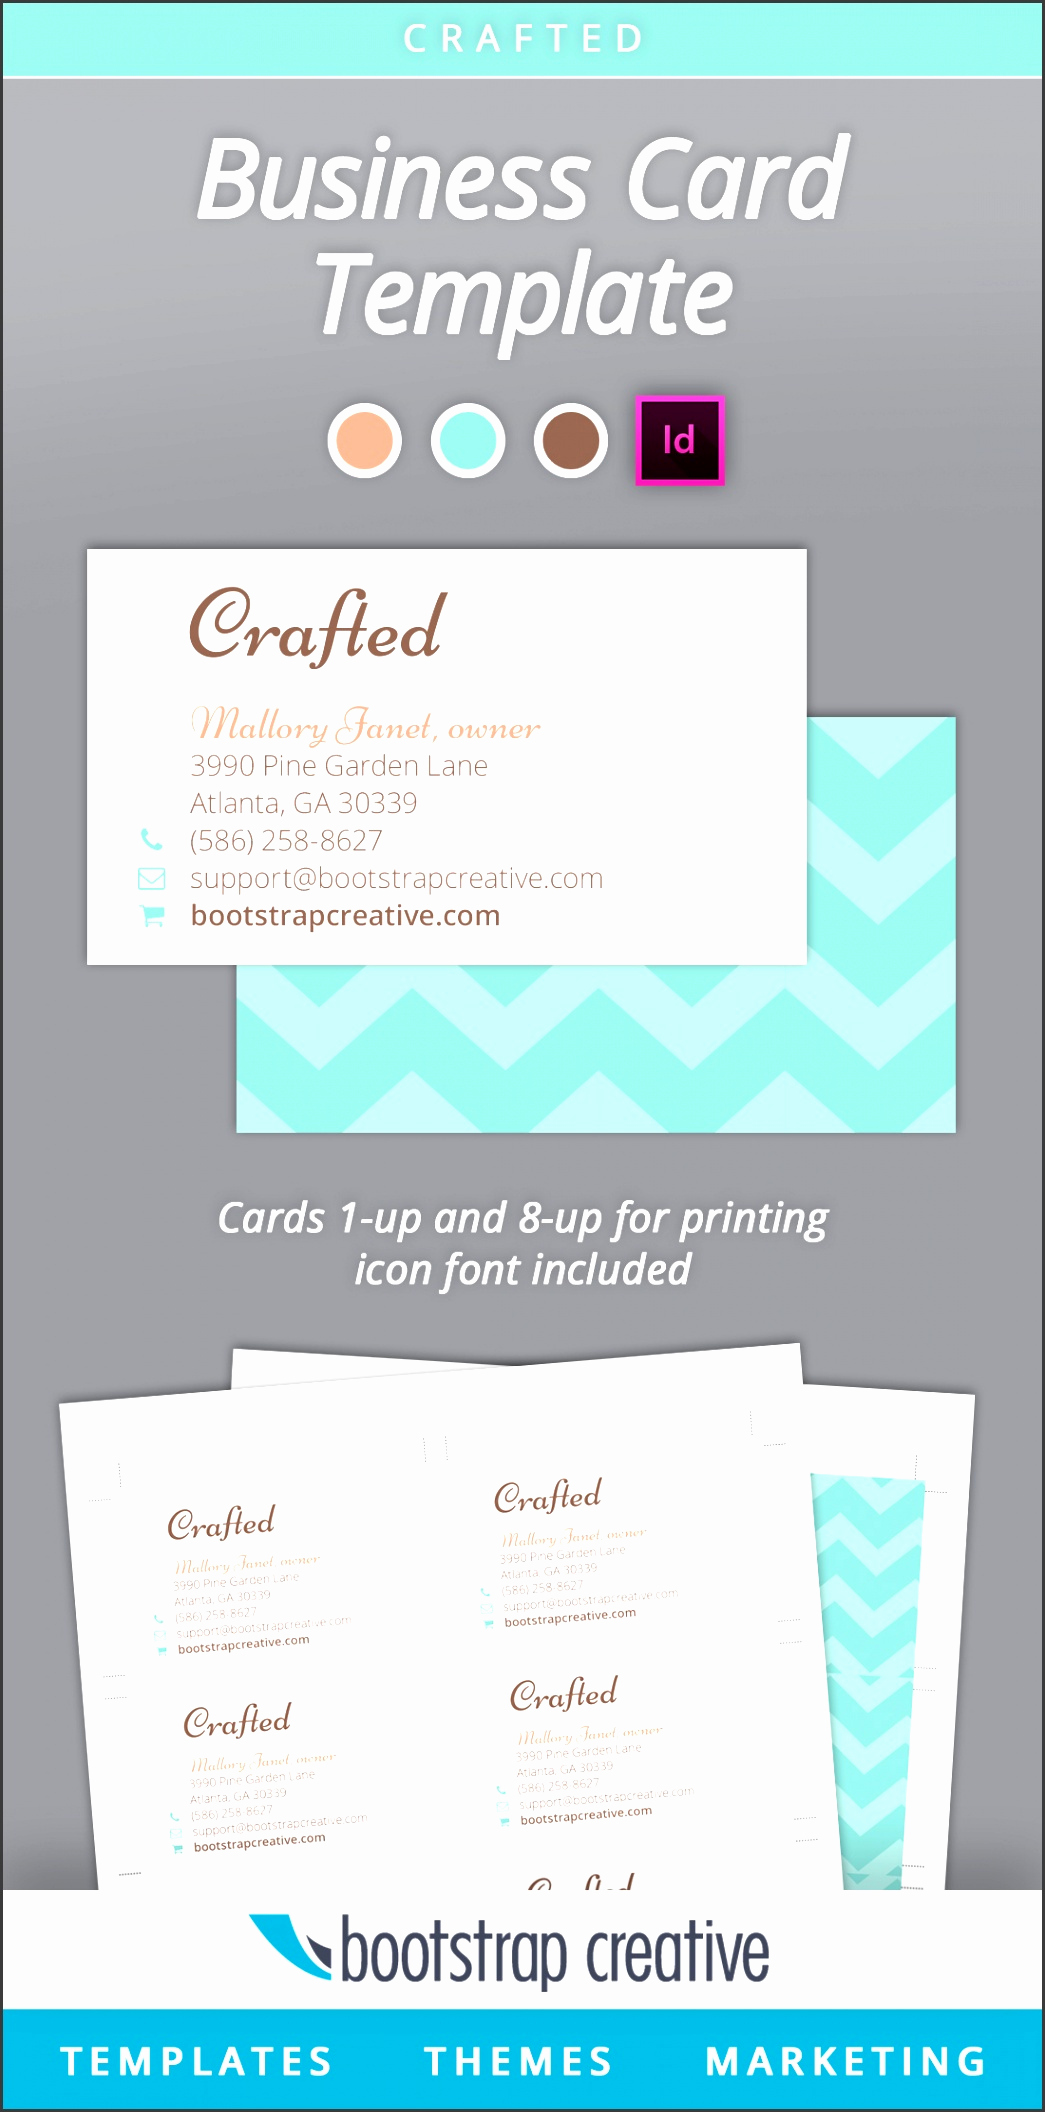 Indesign Business Card Template Inspirational 5 Adobe Indesign Business Card Template Sampletemplatess